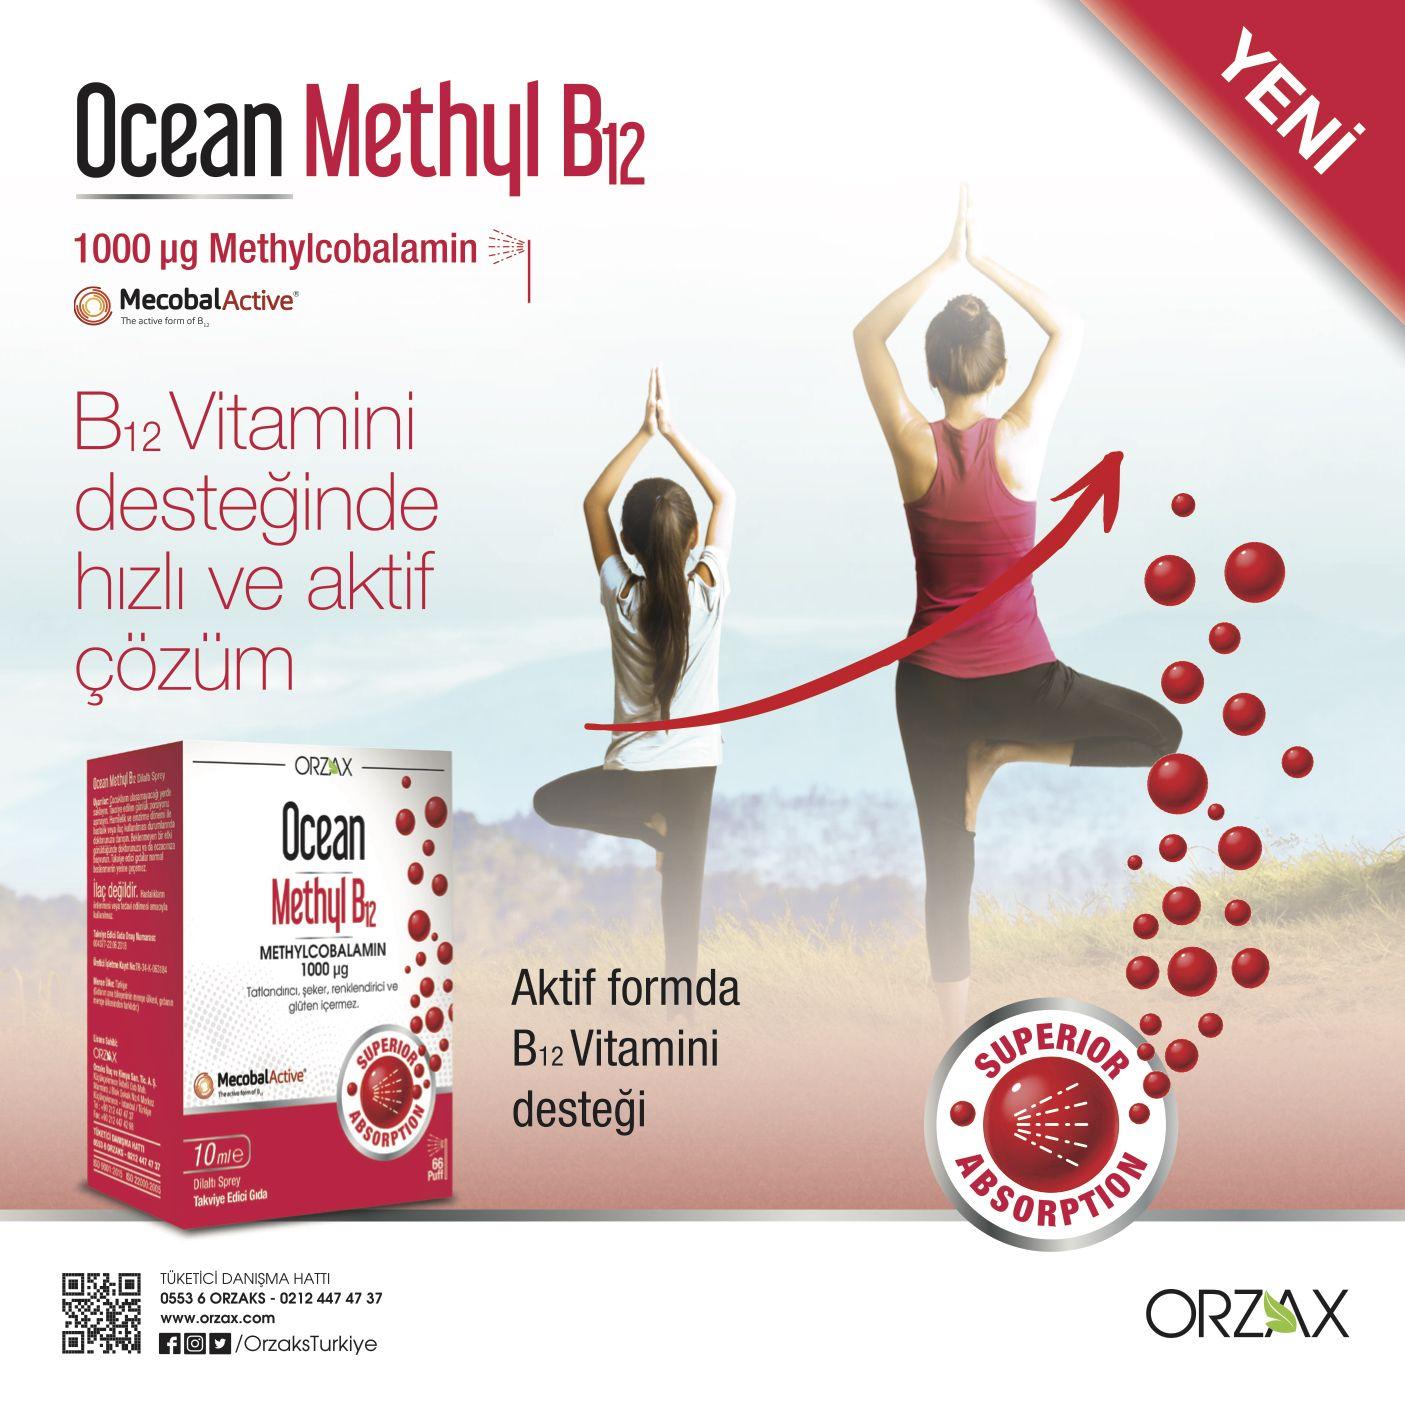 Ocean Methyl B12 Vucudun Direkt Kullanabilecegi Aktif Formda B12 Vitamini Iceren Gida Takviyesidir Yenilikci Dilalti Sprey Formda Sunu Instagram Urunler Gida